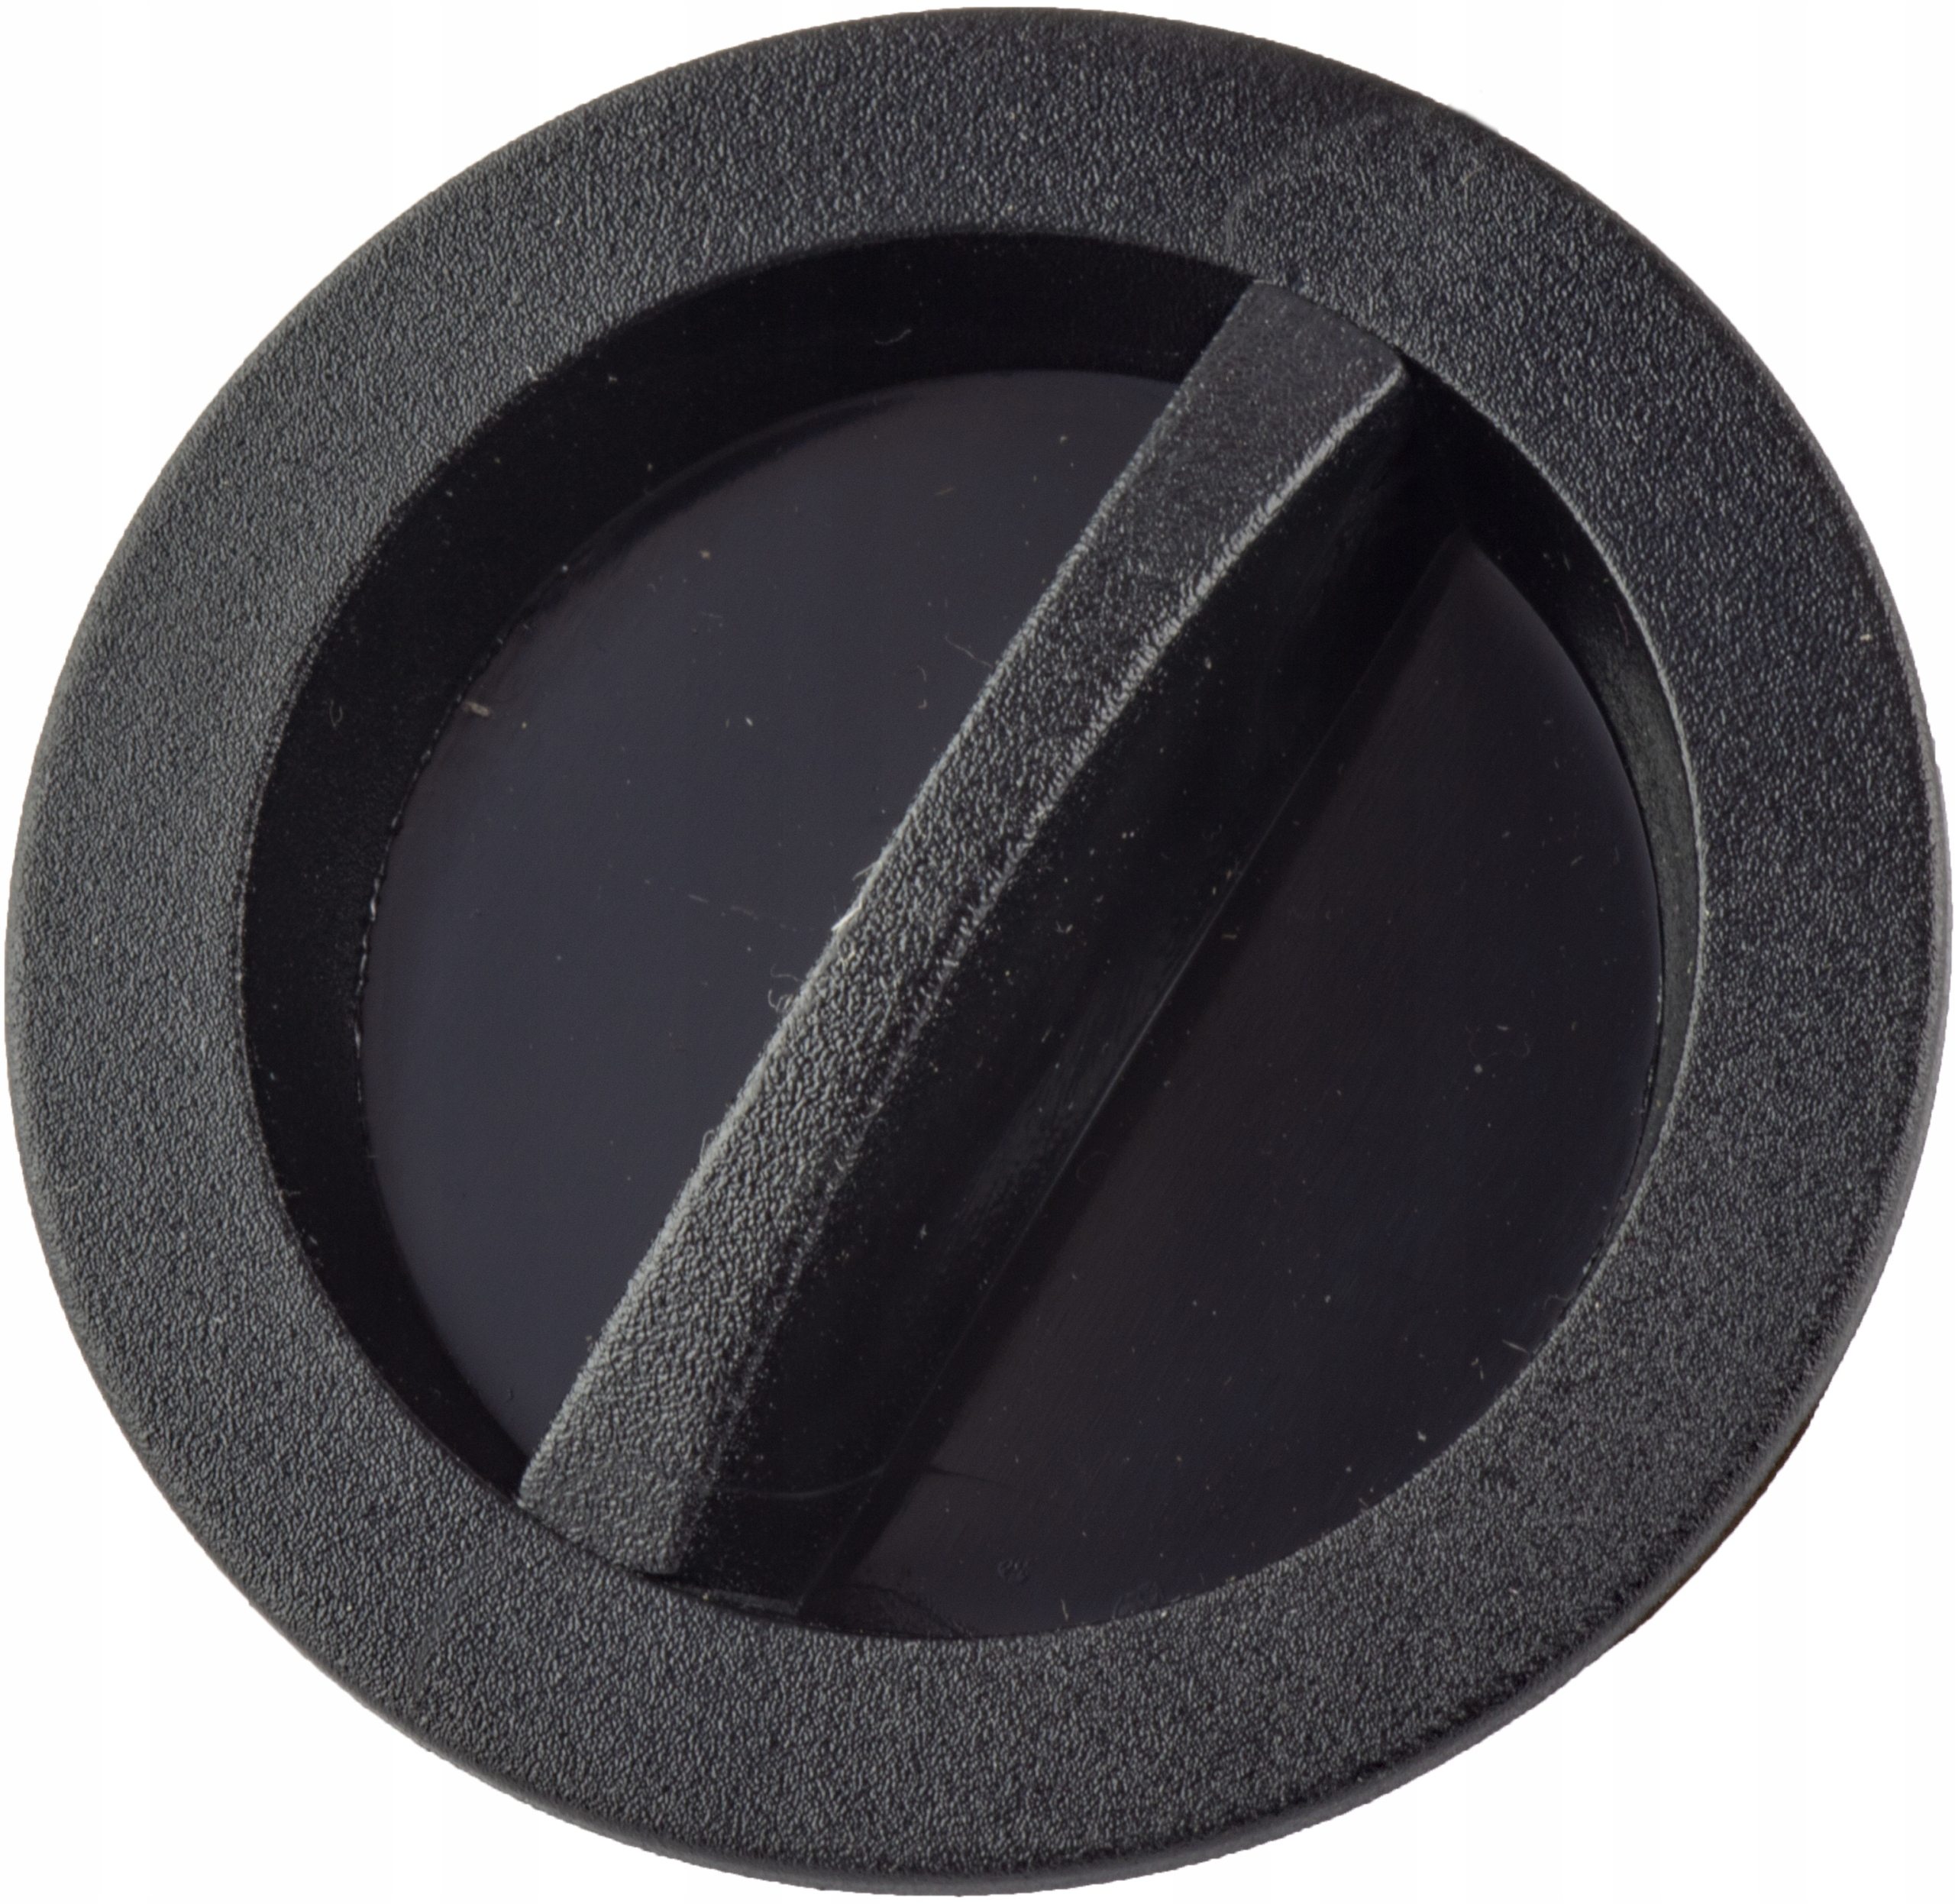 пробка к настой газа заглушка заглушка снг 10mm m10